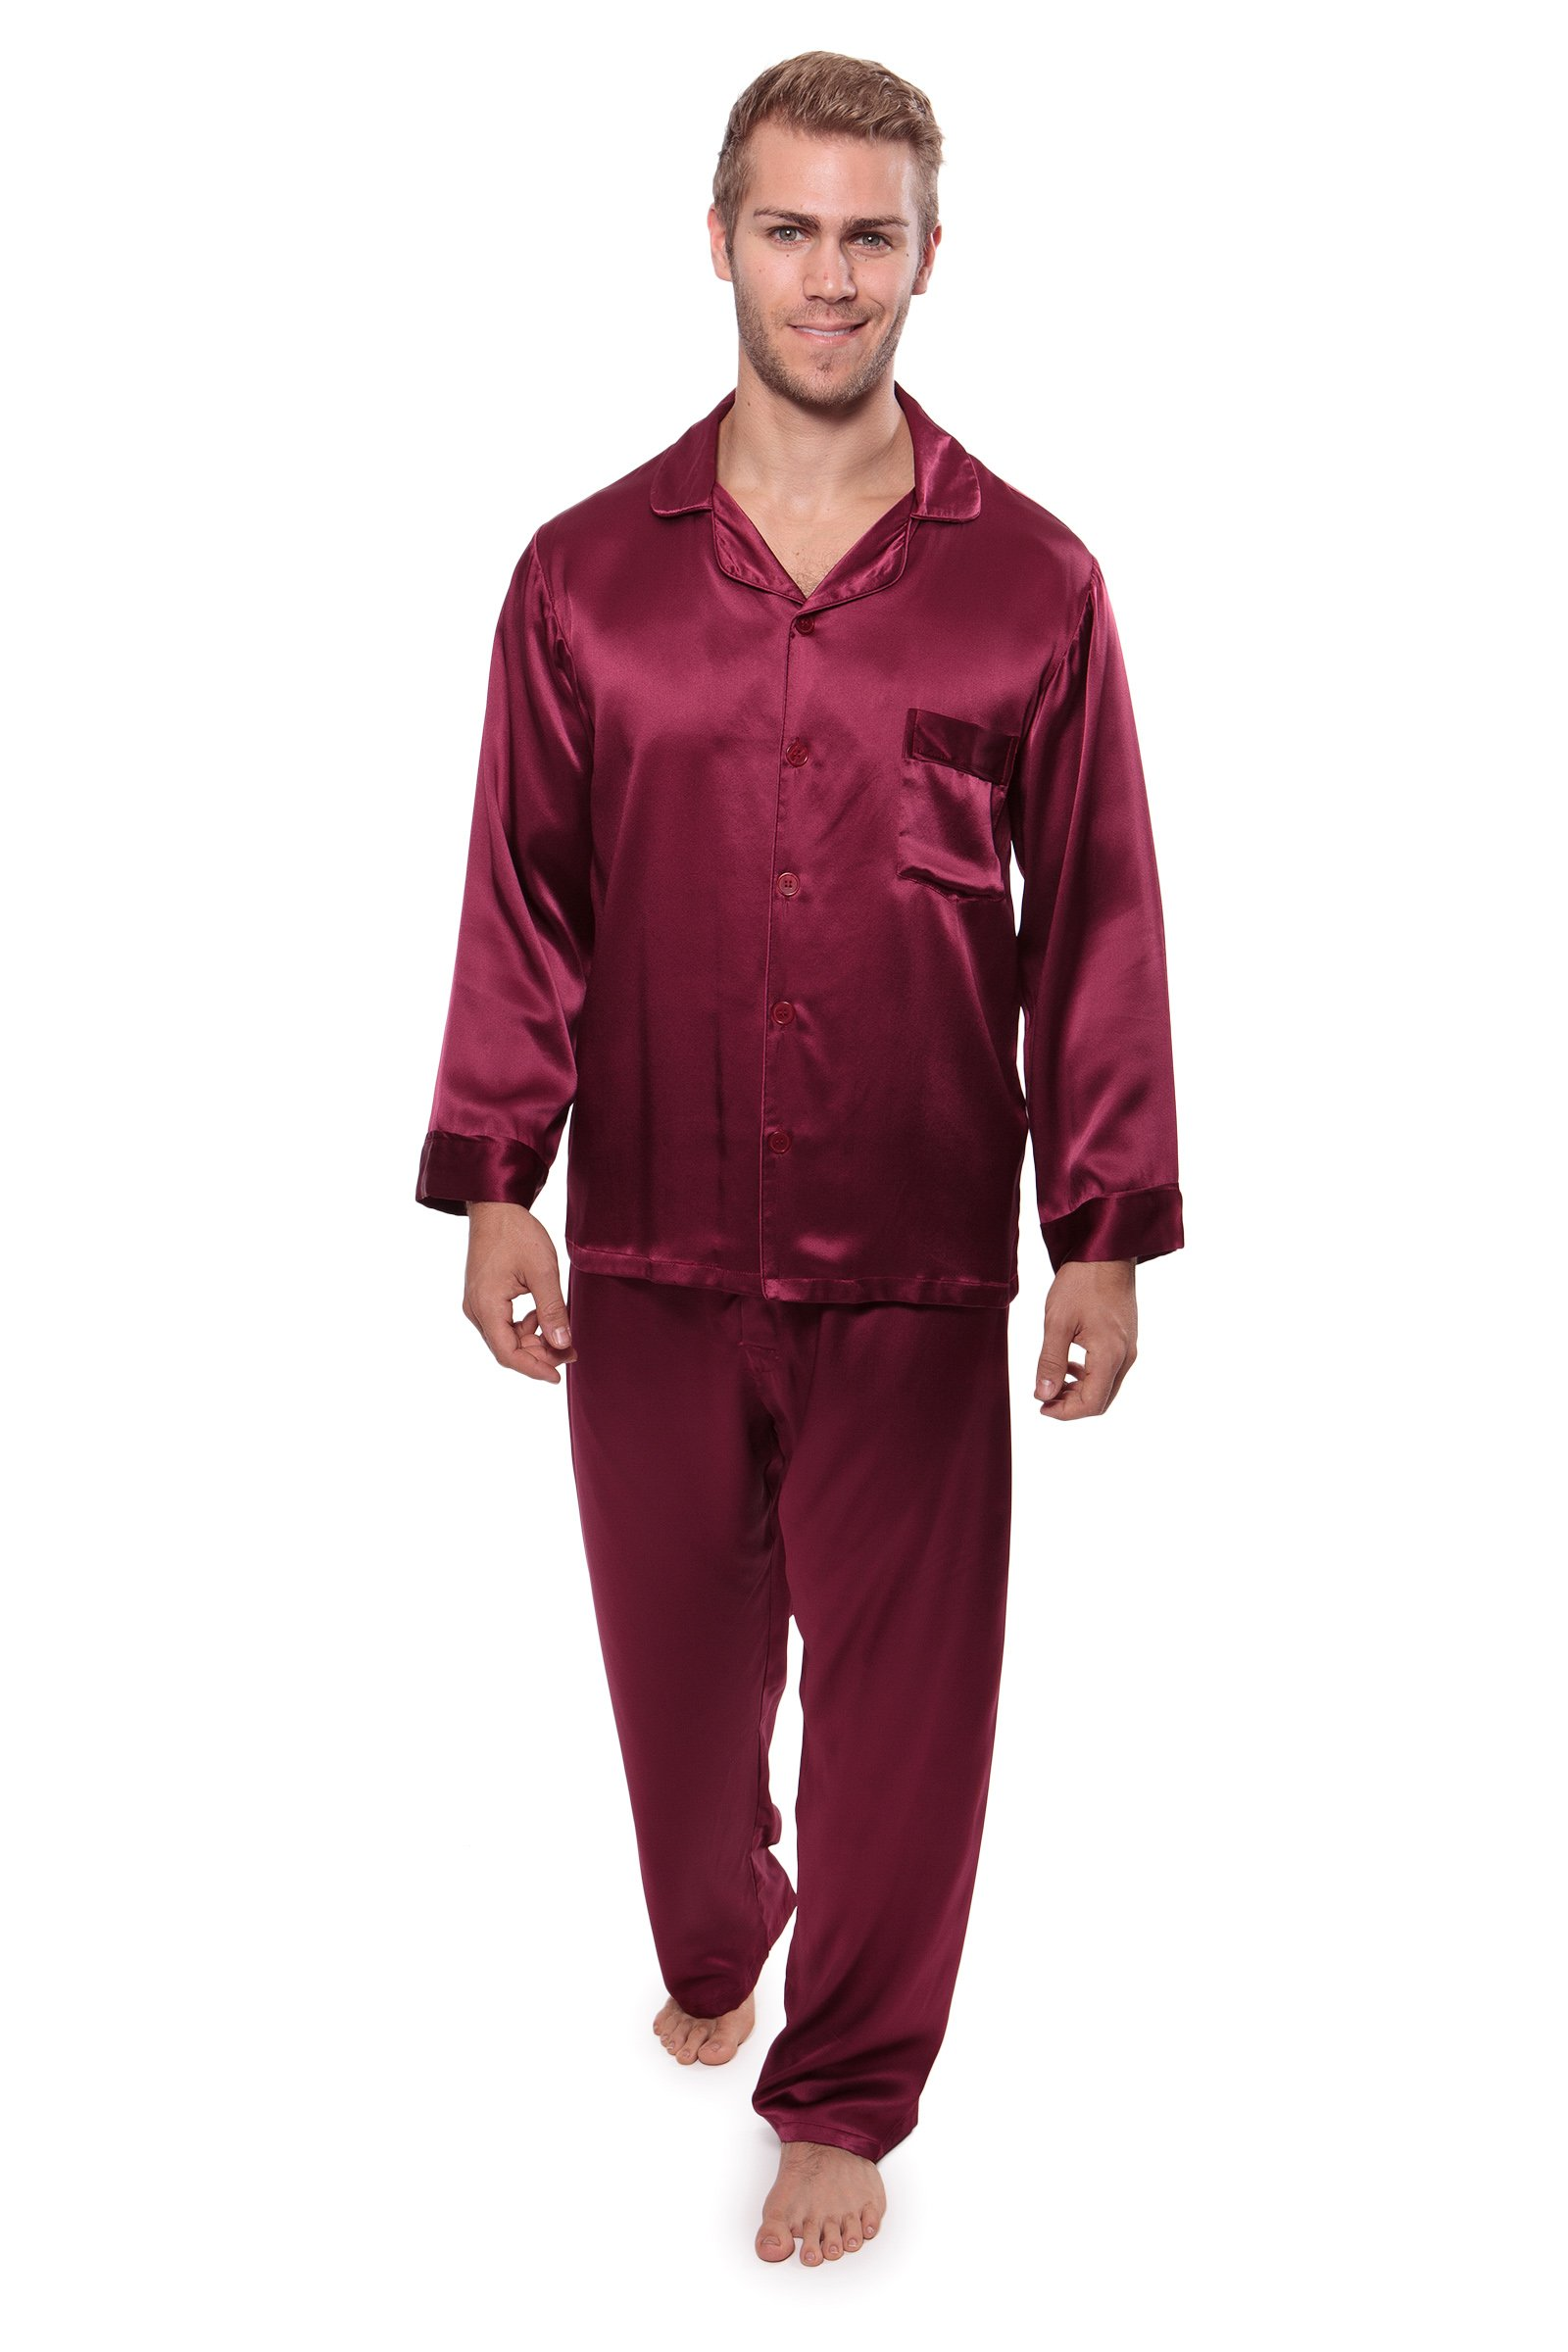 Men's 100% Silk Pajama Set - Luxury Nightwear Pajamas by TexereSilk (Milaroma, Burgundy, Medium) Men's Gift Guide MS0001-BRG-M